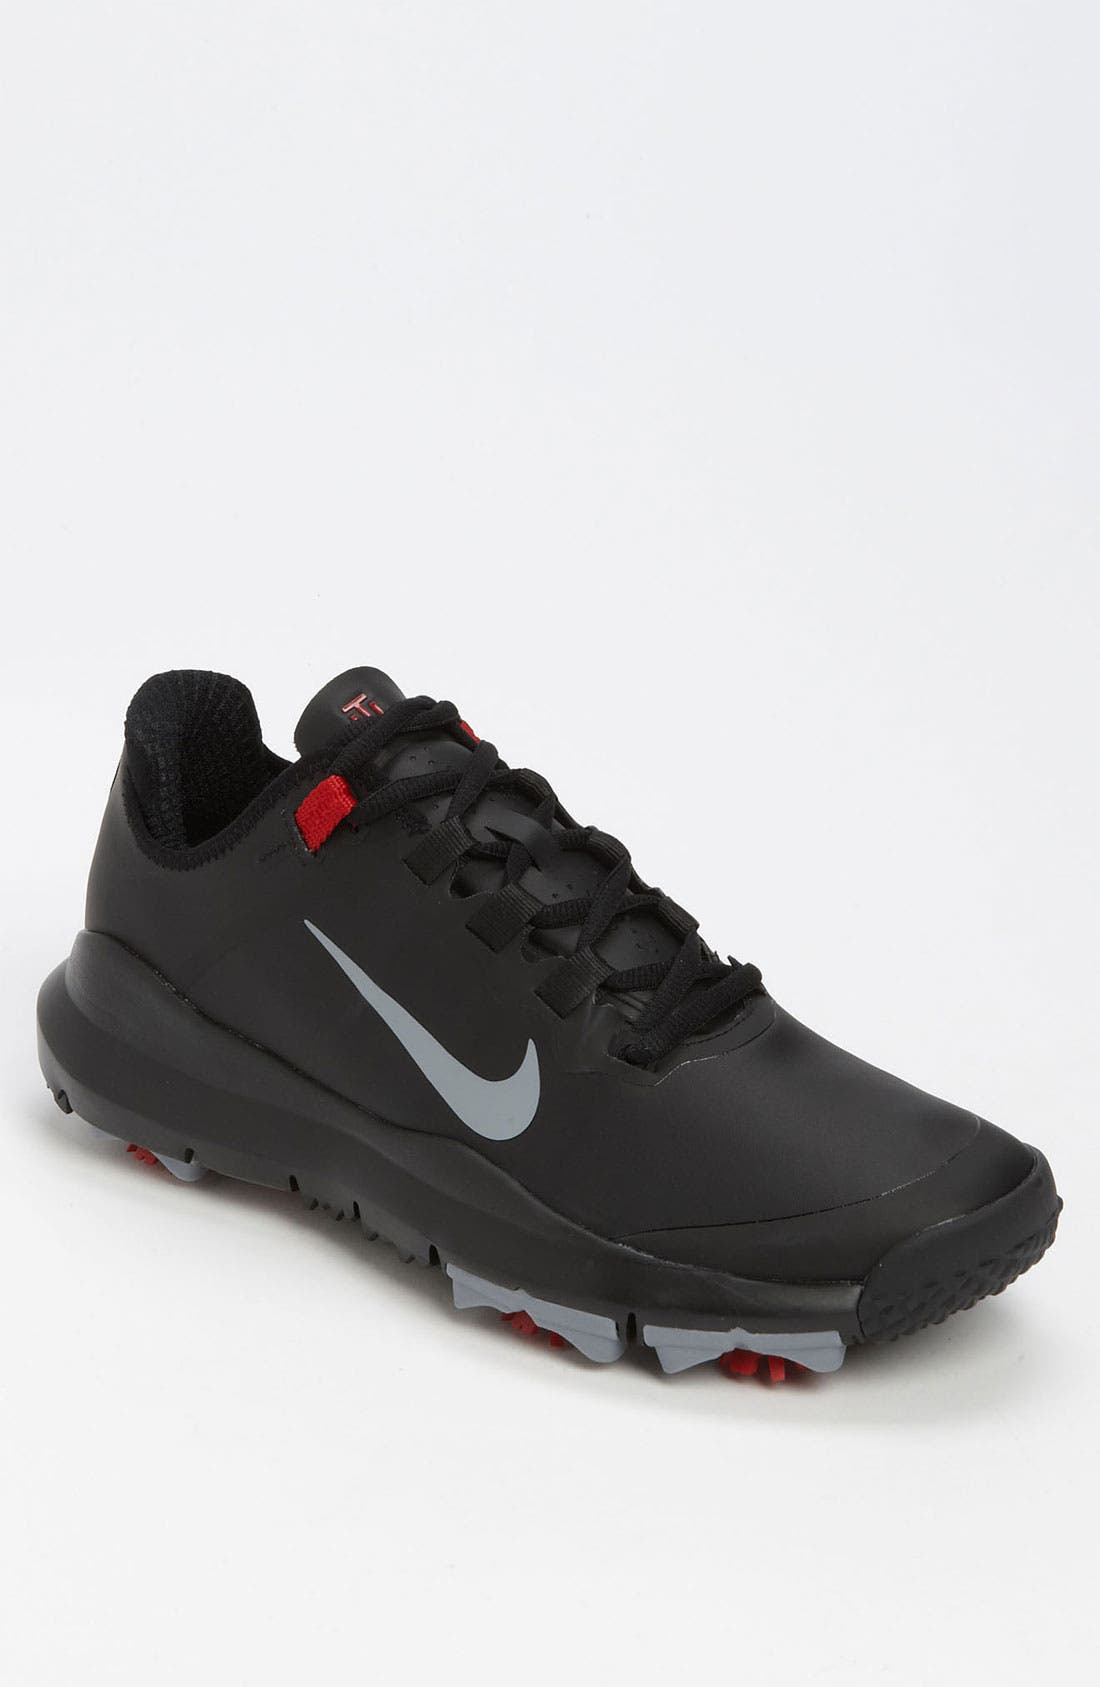 Alternate Image 1 Selected - Nike 'TW 13' Golf Shoe (Men) (Online Only)